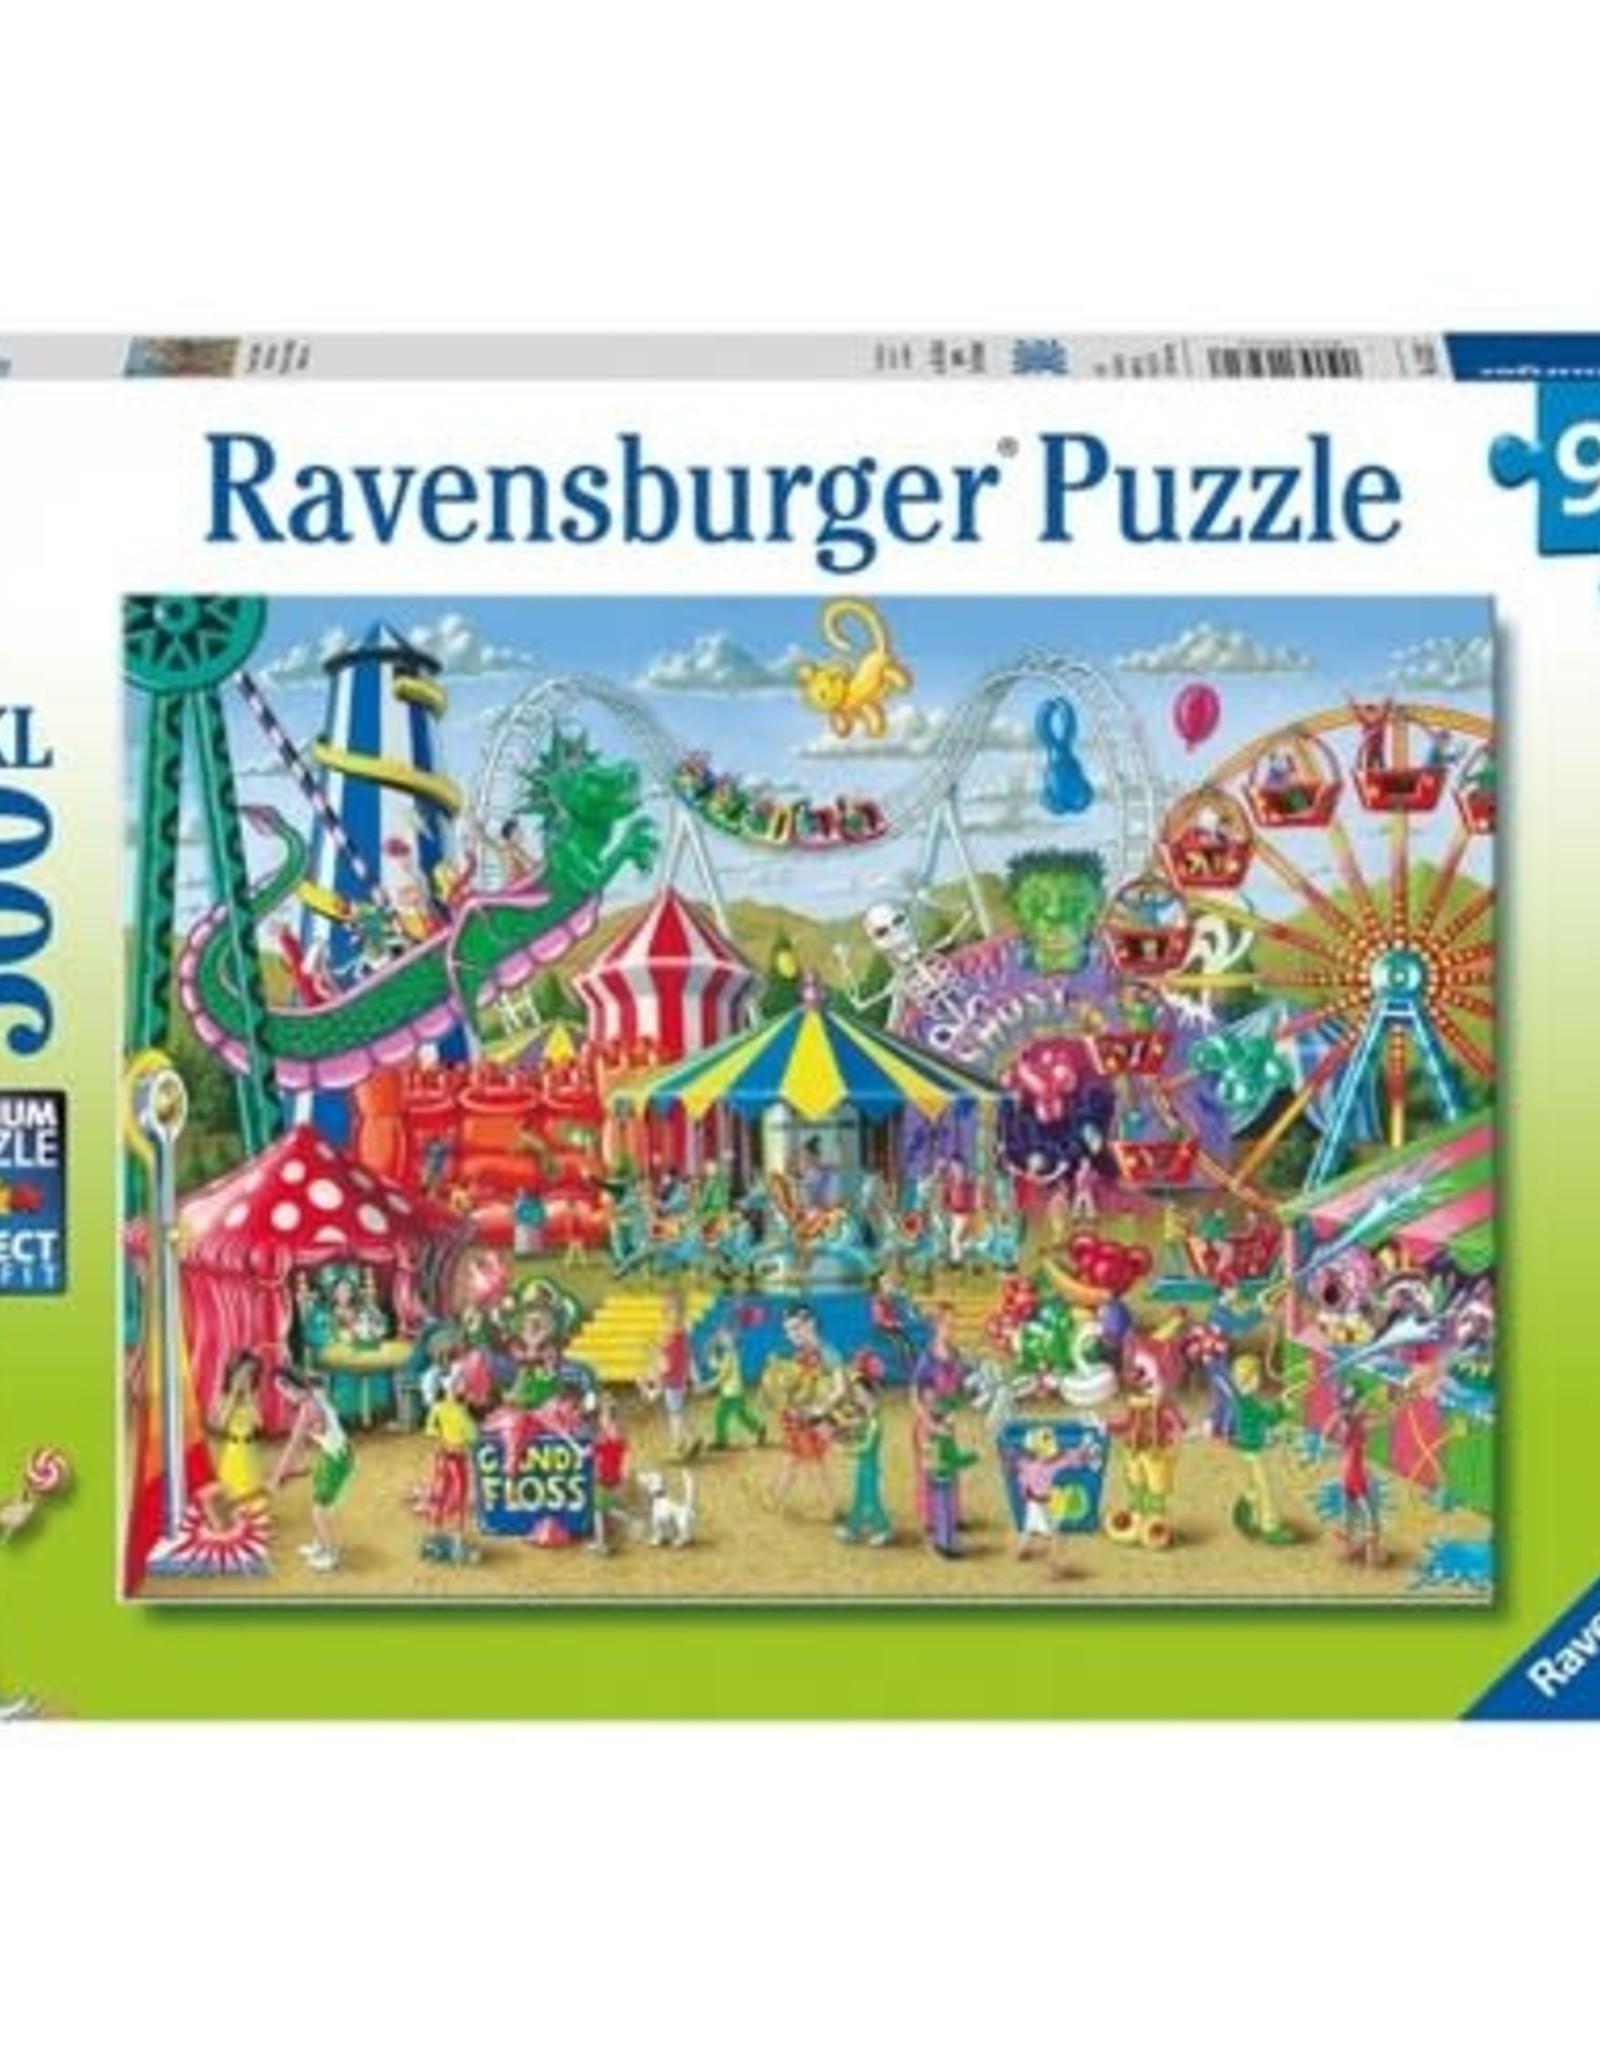 Ravensburger 300pc XXL puzzle Fun at Carnival